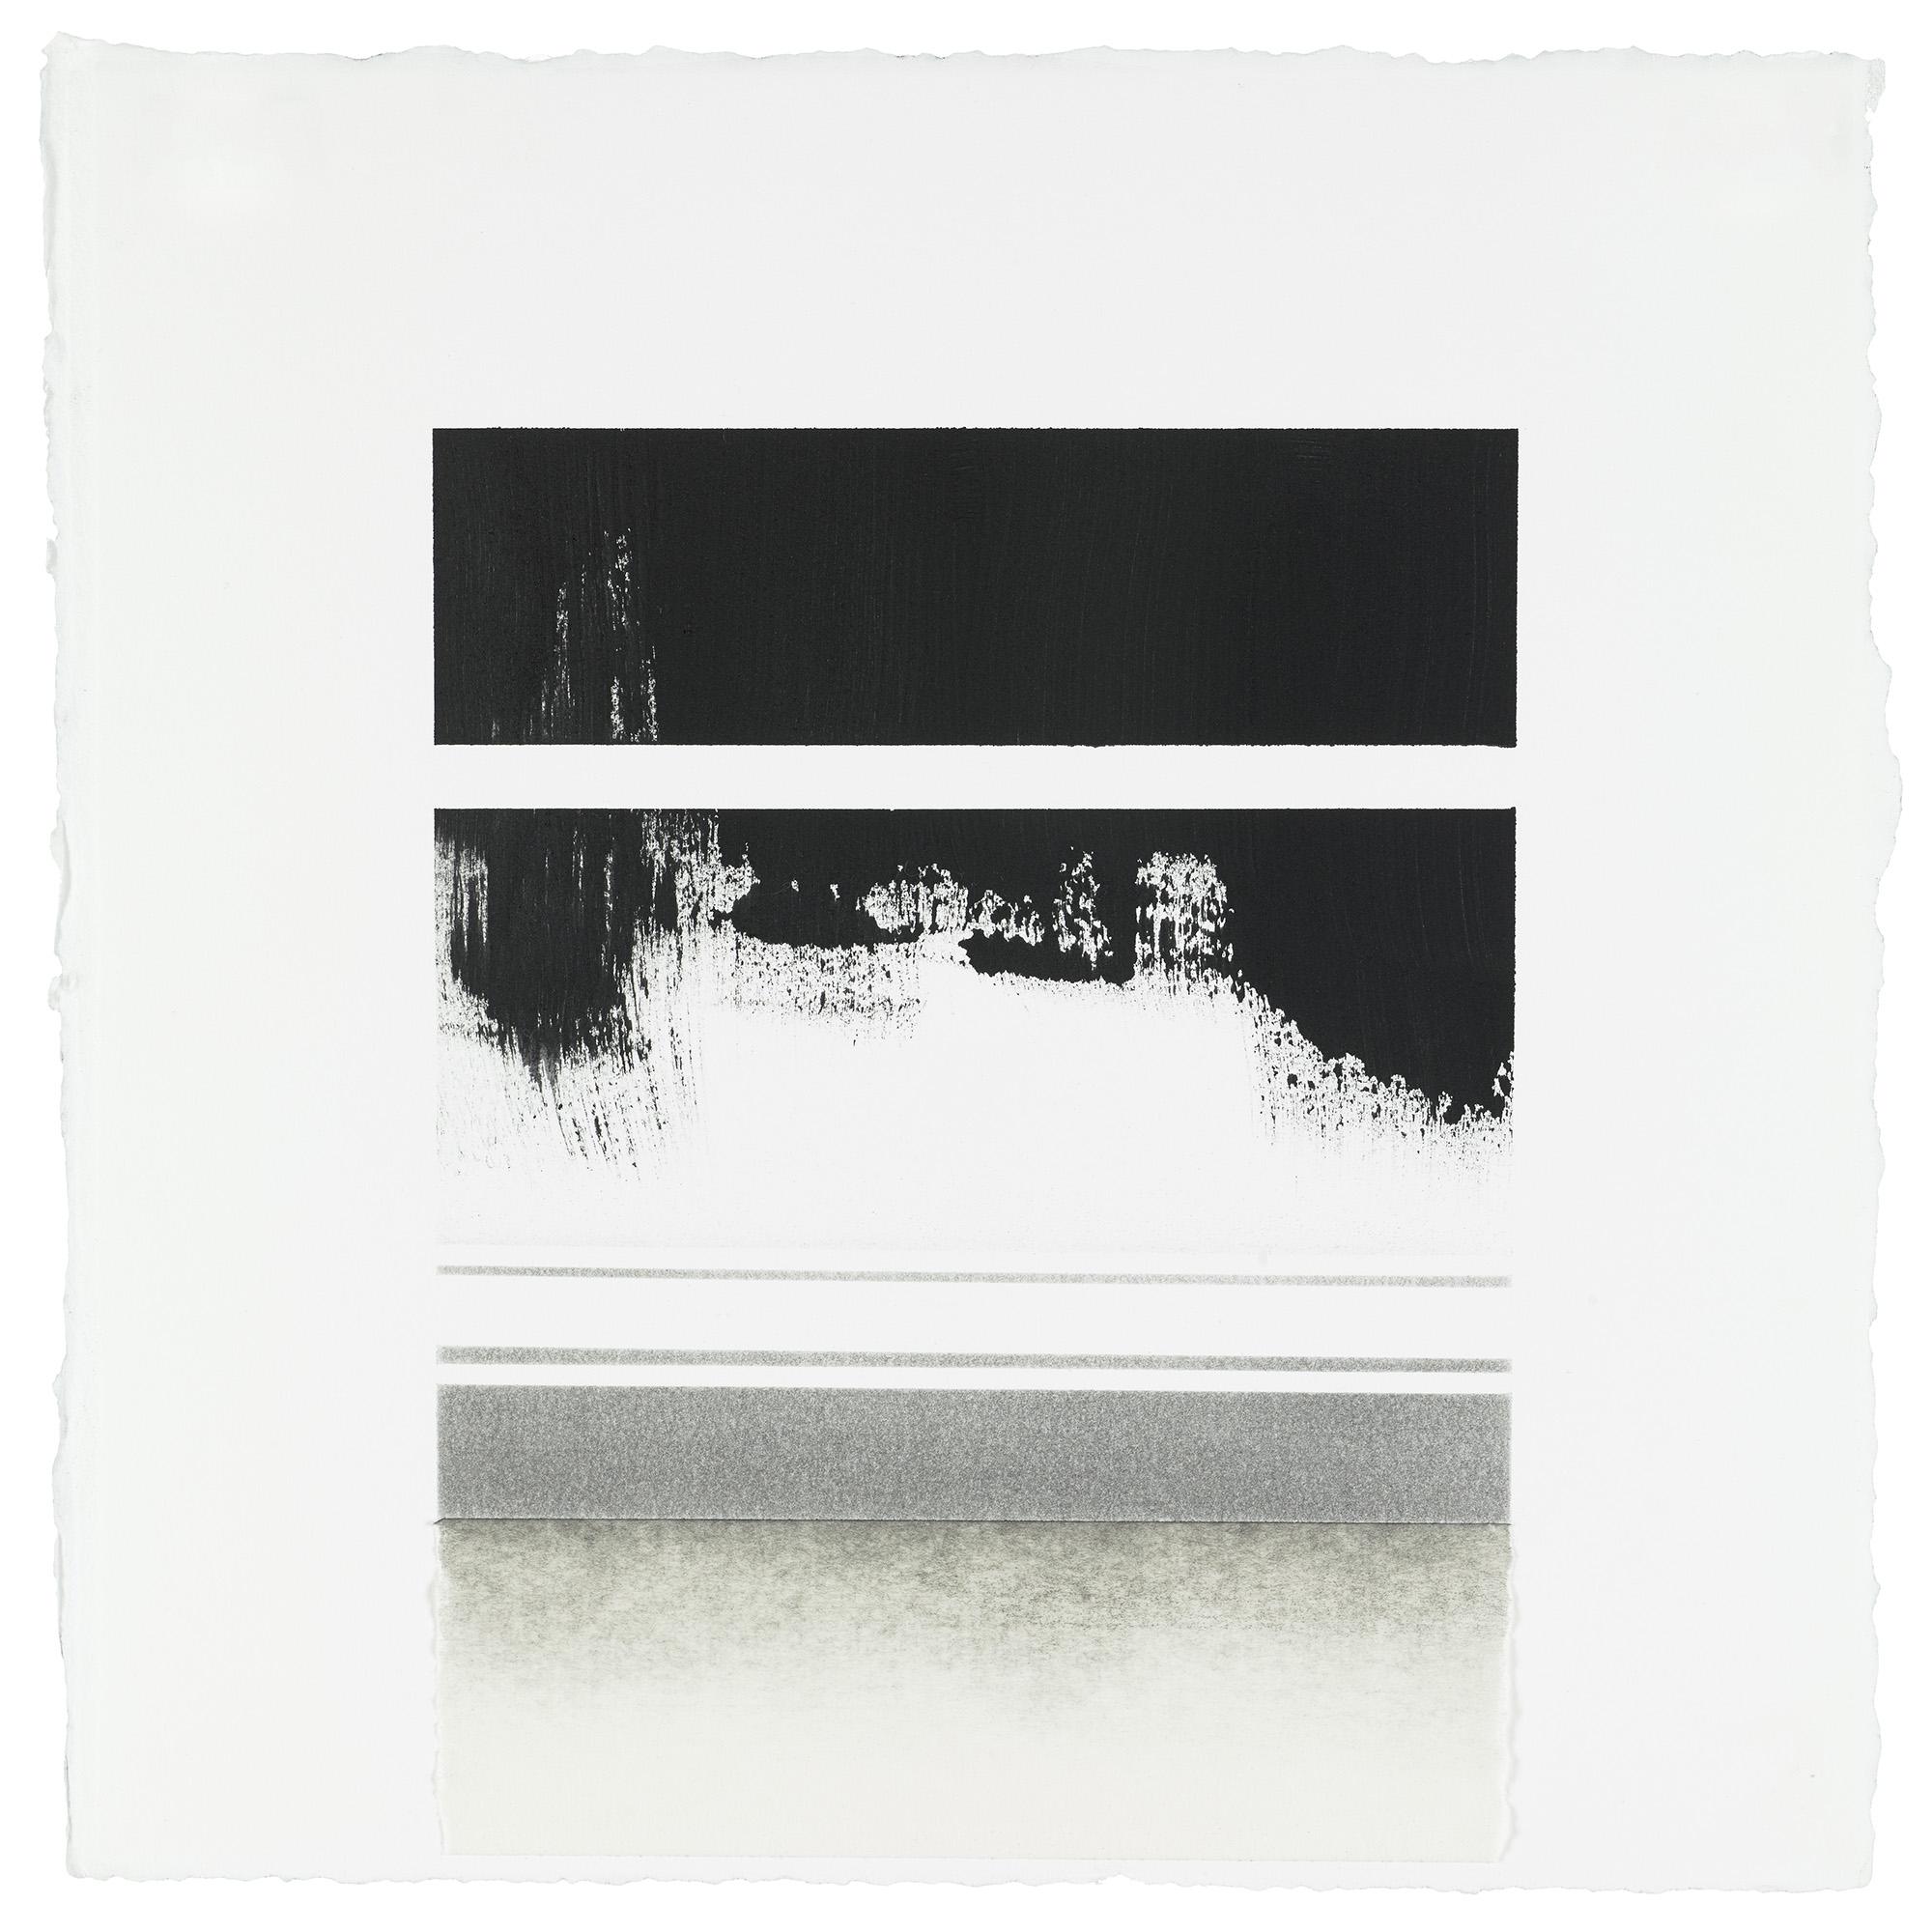 "ML66, peach pit soot, rabbit skin glue, graphite, 10.5""x10.5"", 2017"